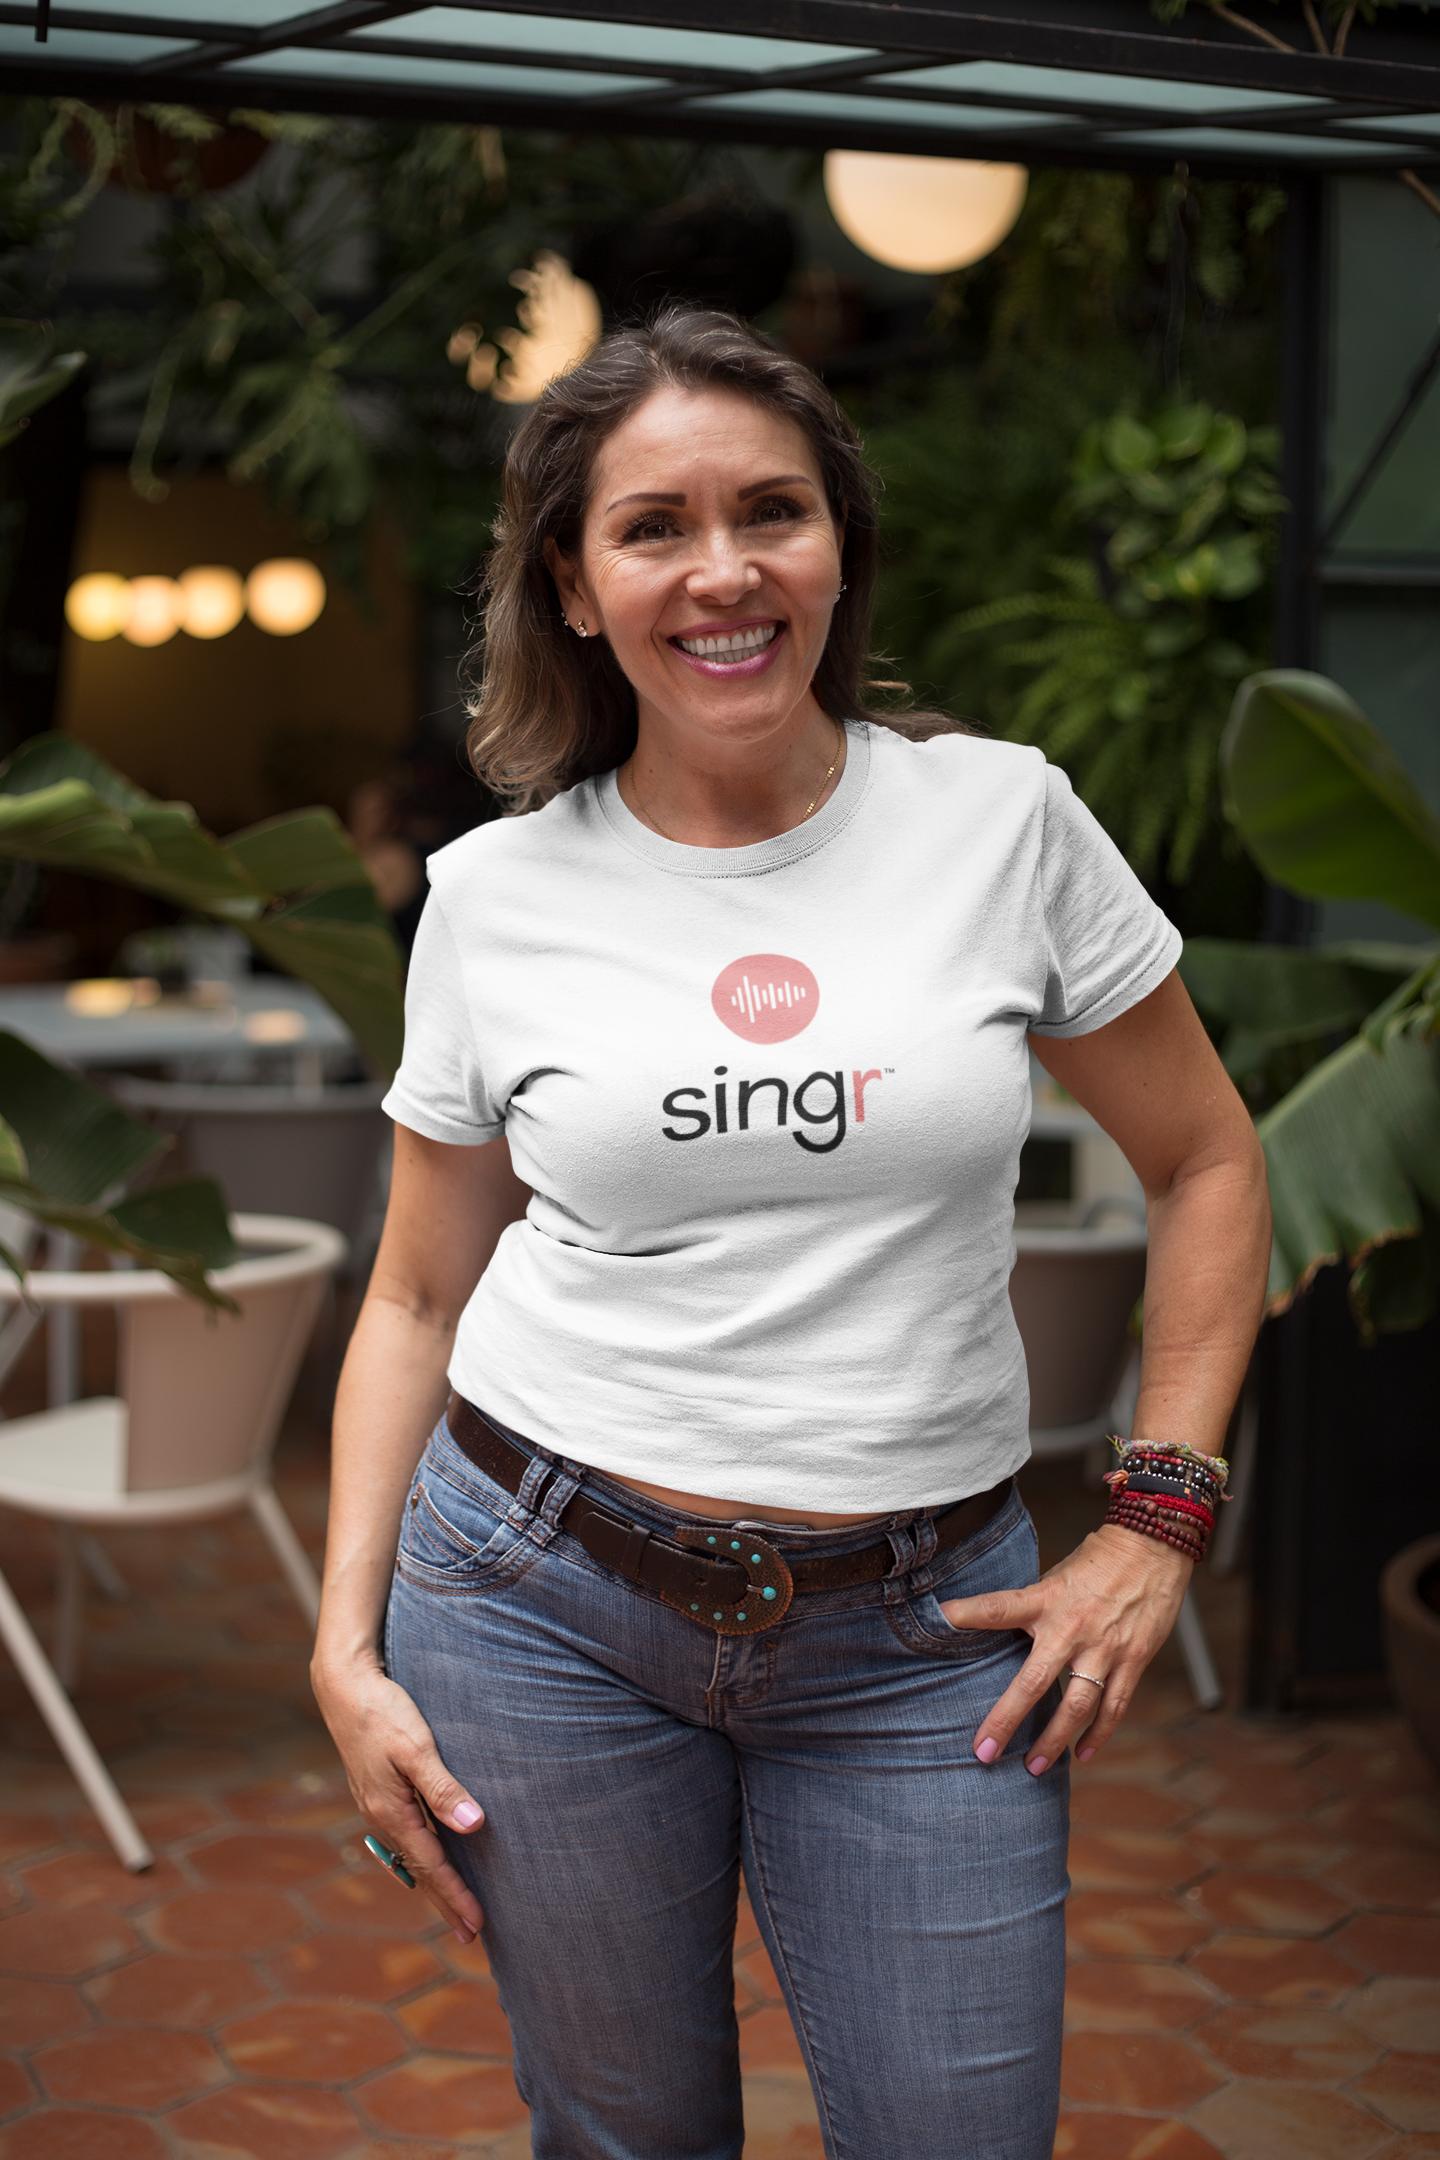 senior-woman-posing-wearing-a-t-shirt-mockup-at-a-coffee-shop-a20364.png